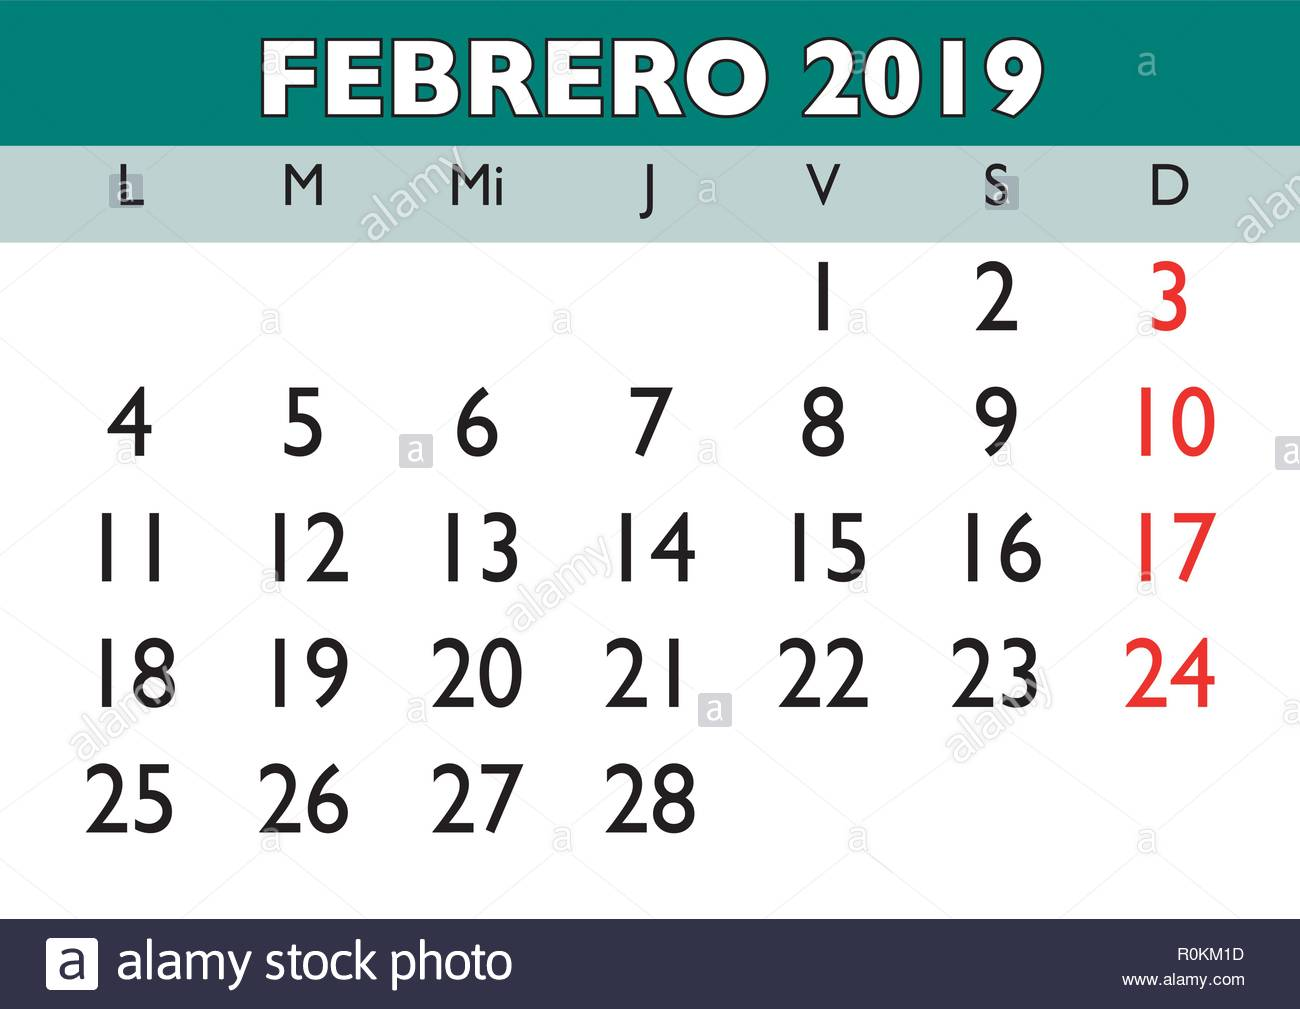 Febrero 2019 Calendario.February Month In A Year 2019 Wall Calendar In Spanish Febrero 2019